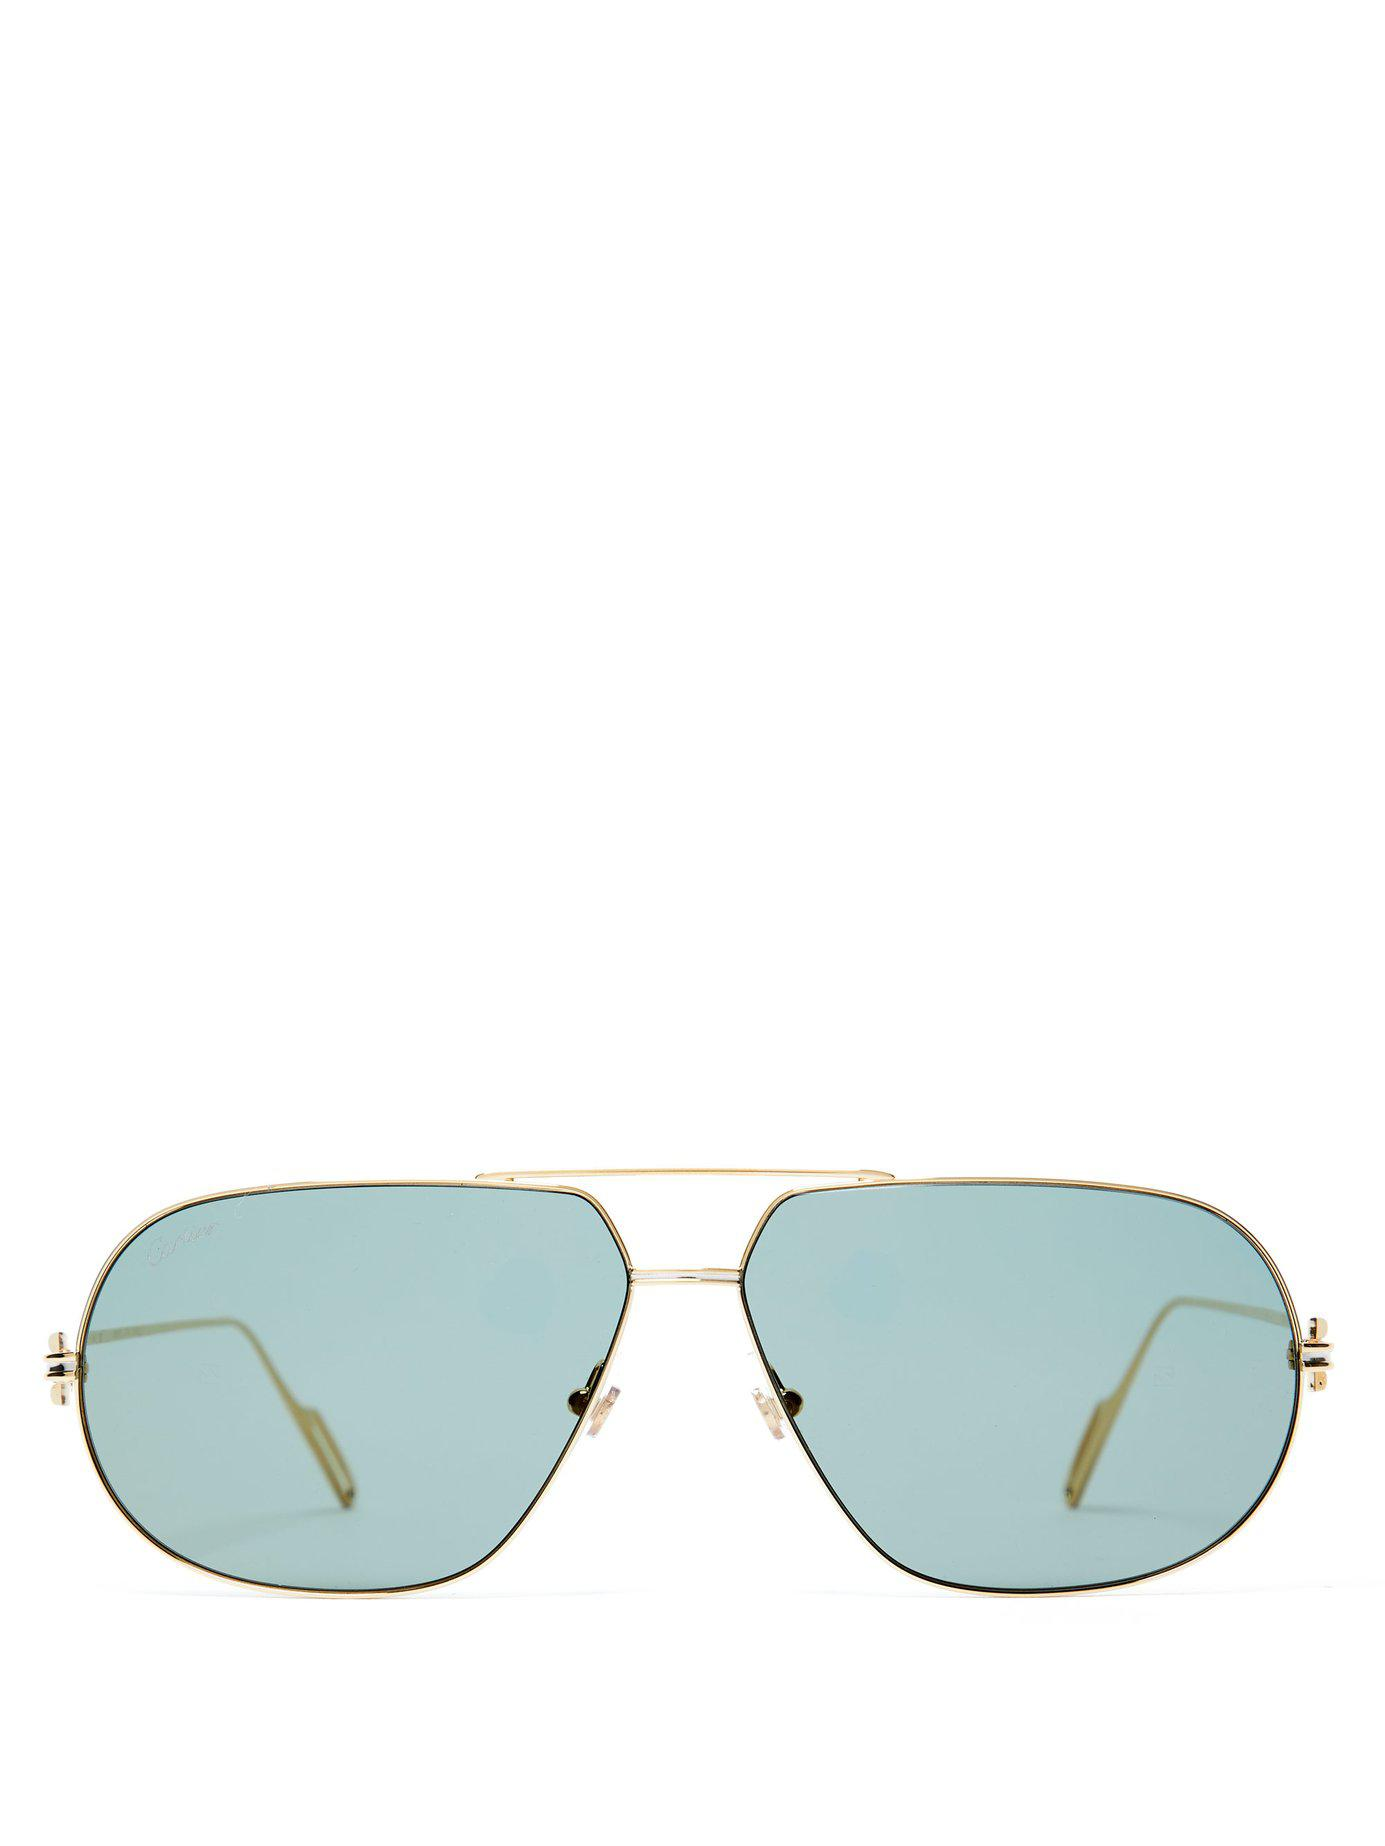 427db9ecd5 Cartier Première De Cartier Aviator Frame Sunglasses in Metallic for ...